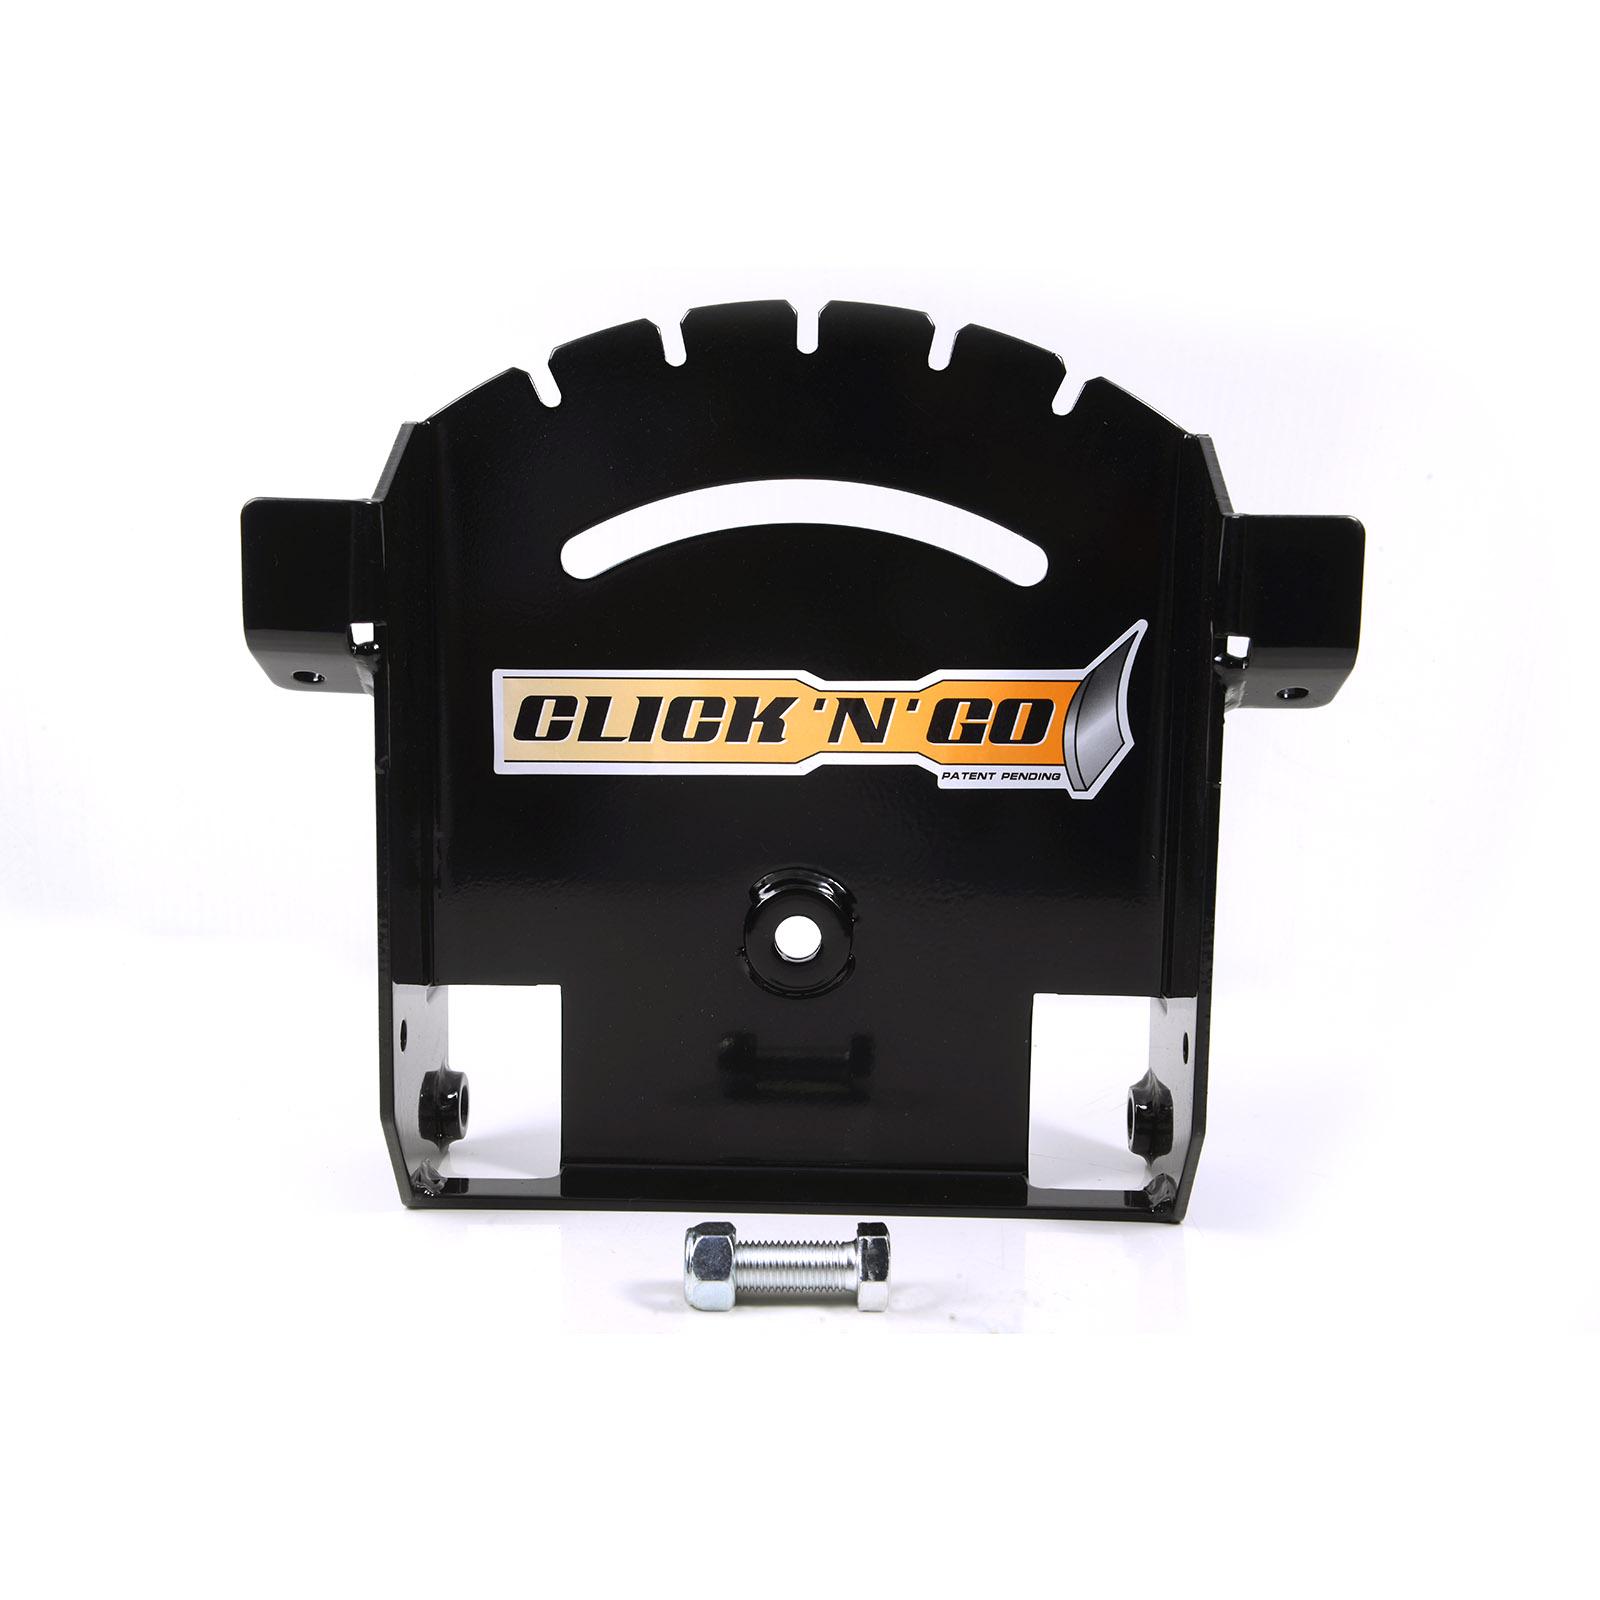 Kimpex CLICK N GO Spring Kit for CNG 2 Plow Frame